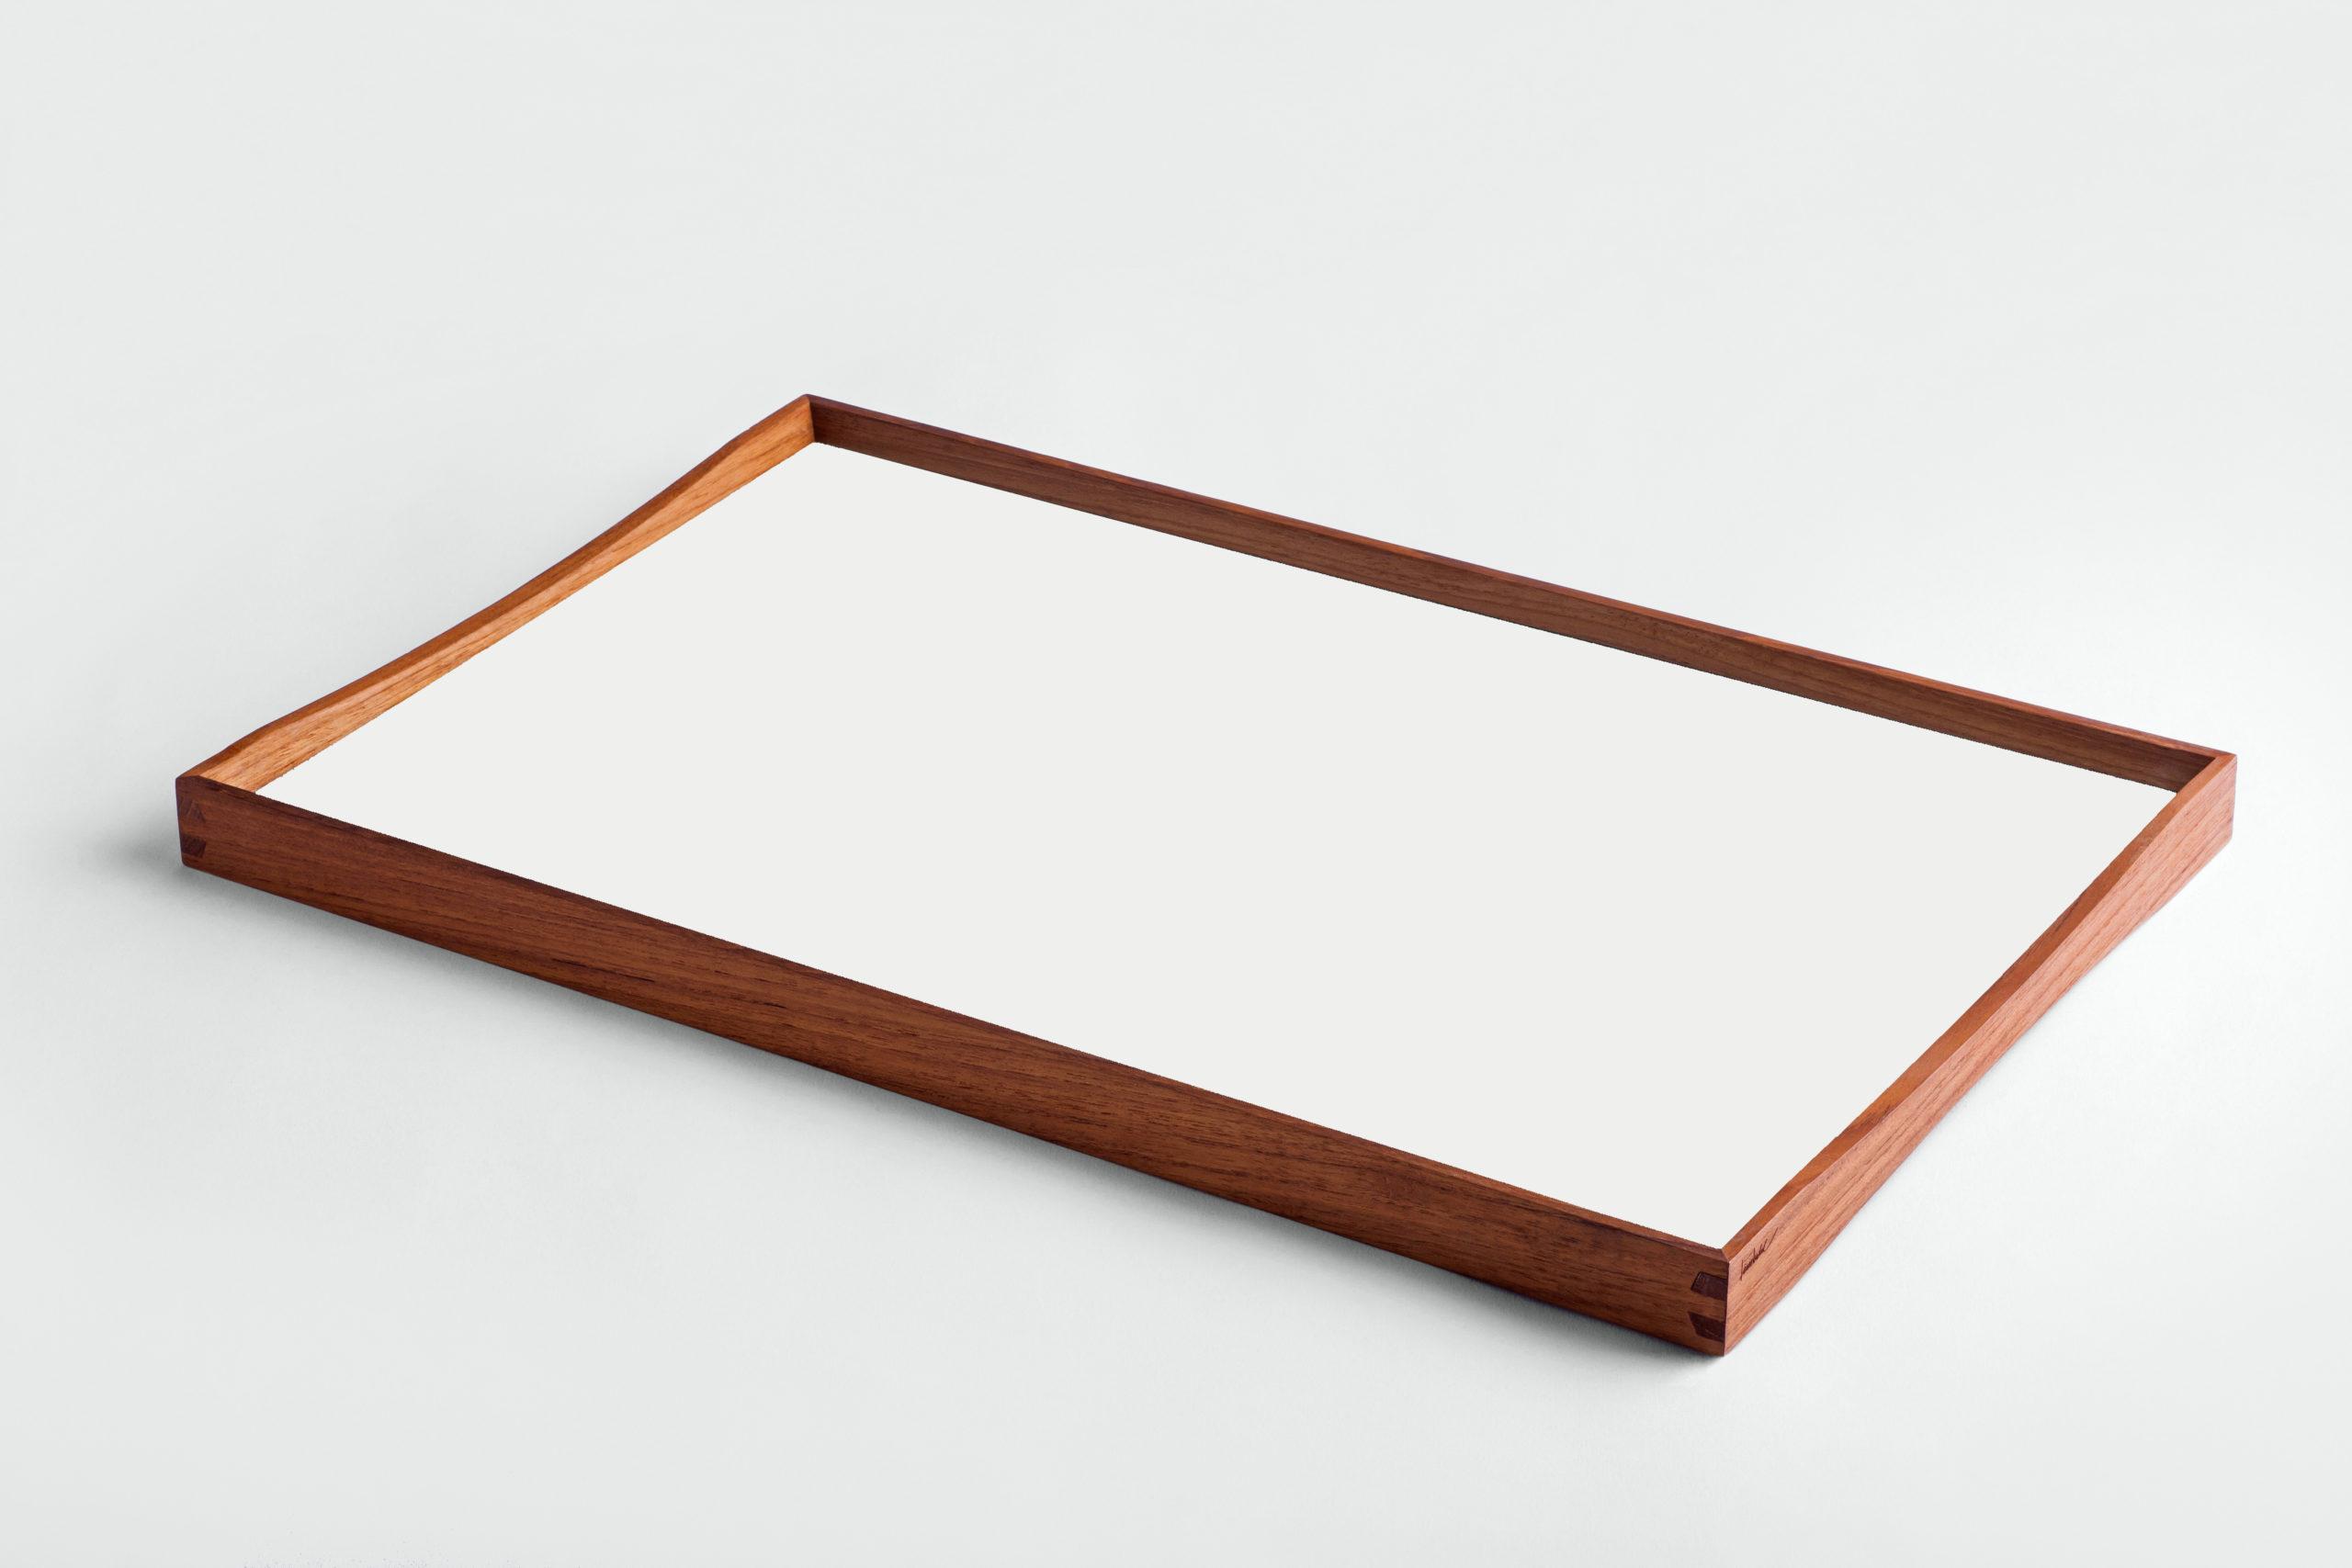 ARCHITECTMADE Turning Tray Medium White Teak Laminate Finn Juhl